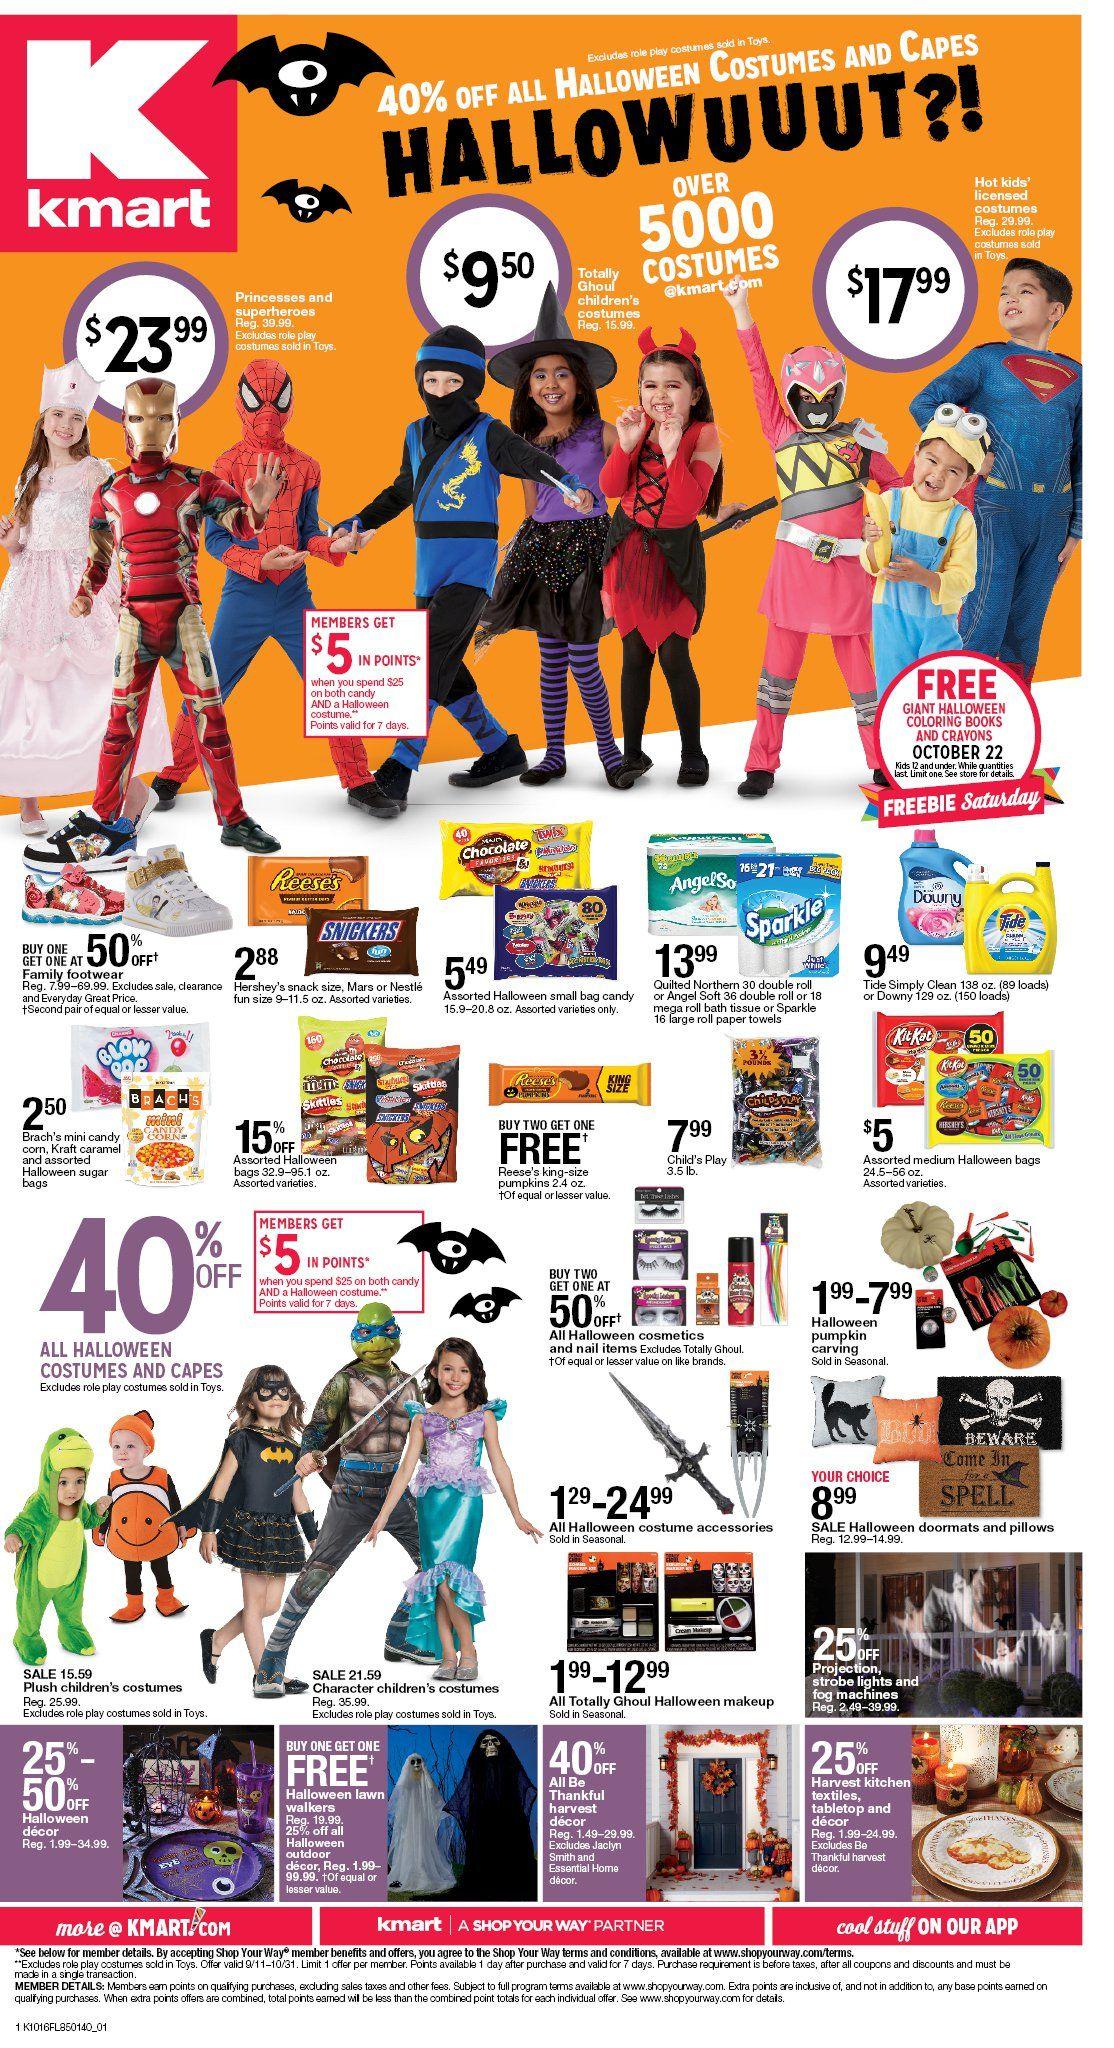 Kmart Halloween Ad Sale Http Www Igroceryads Com Kmart Weekly Ad Old Halloween Costumes Kmart Halloween